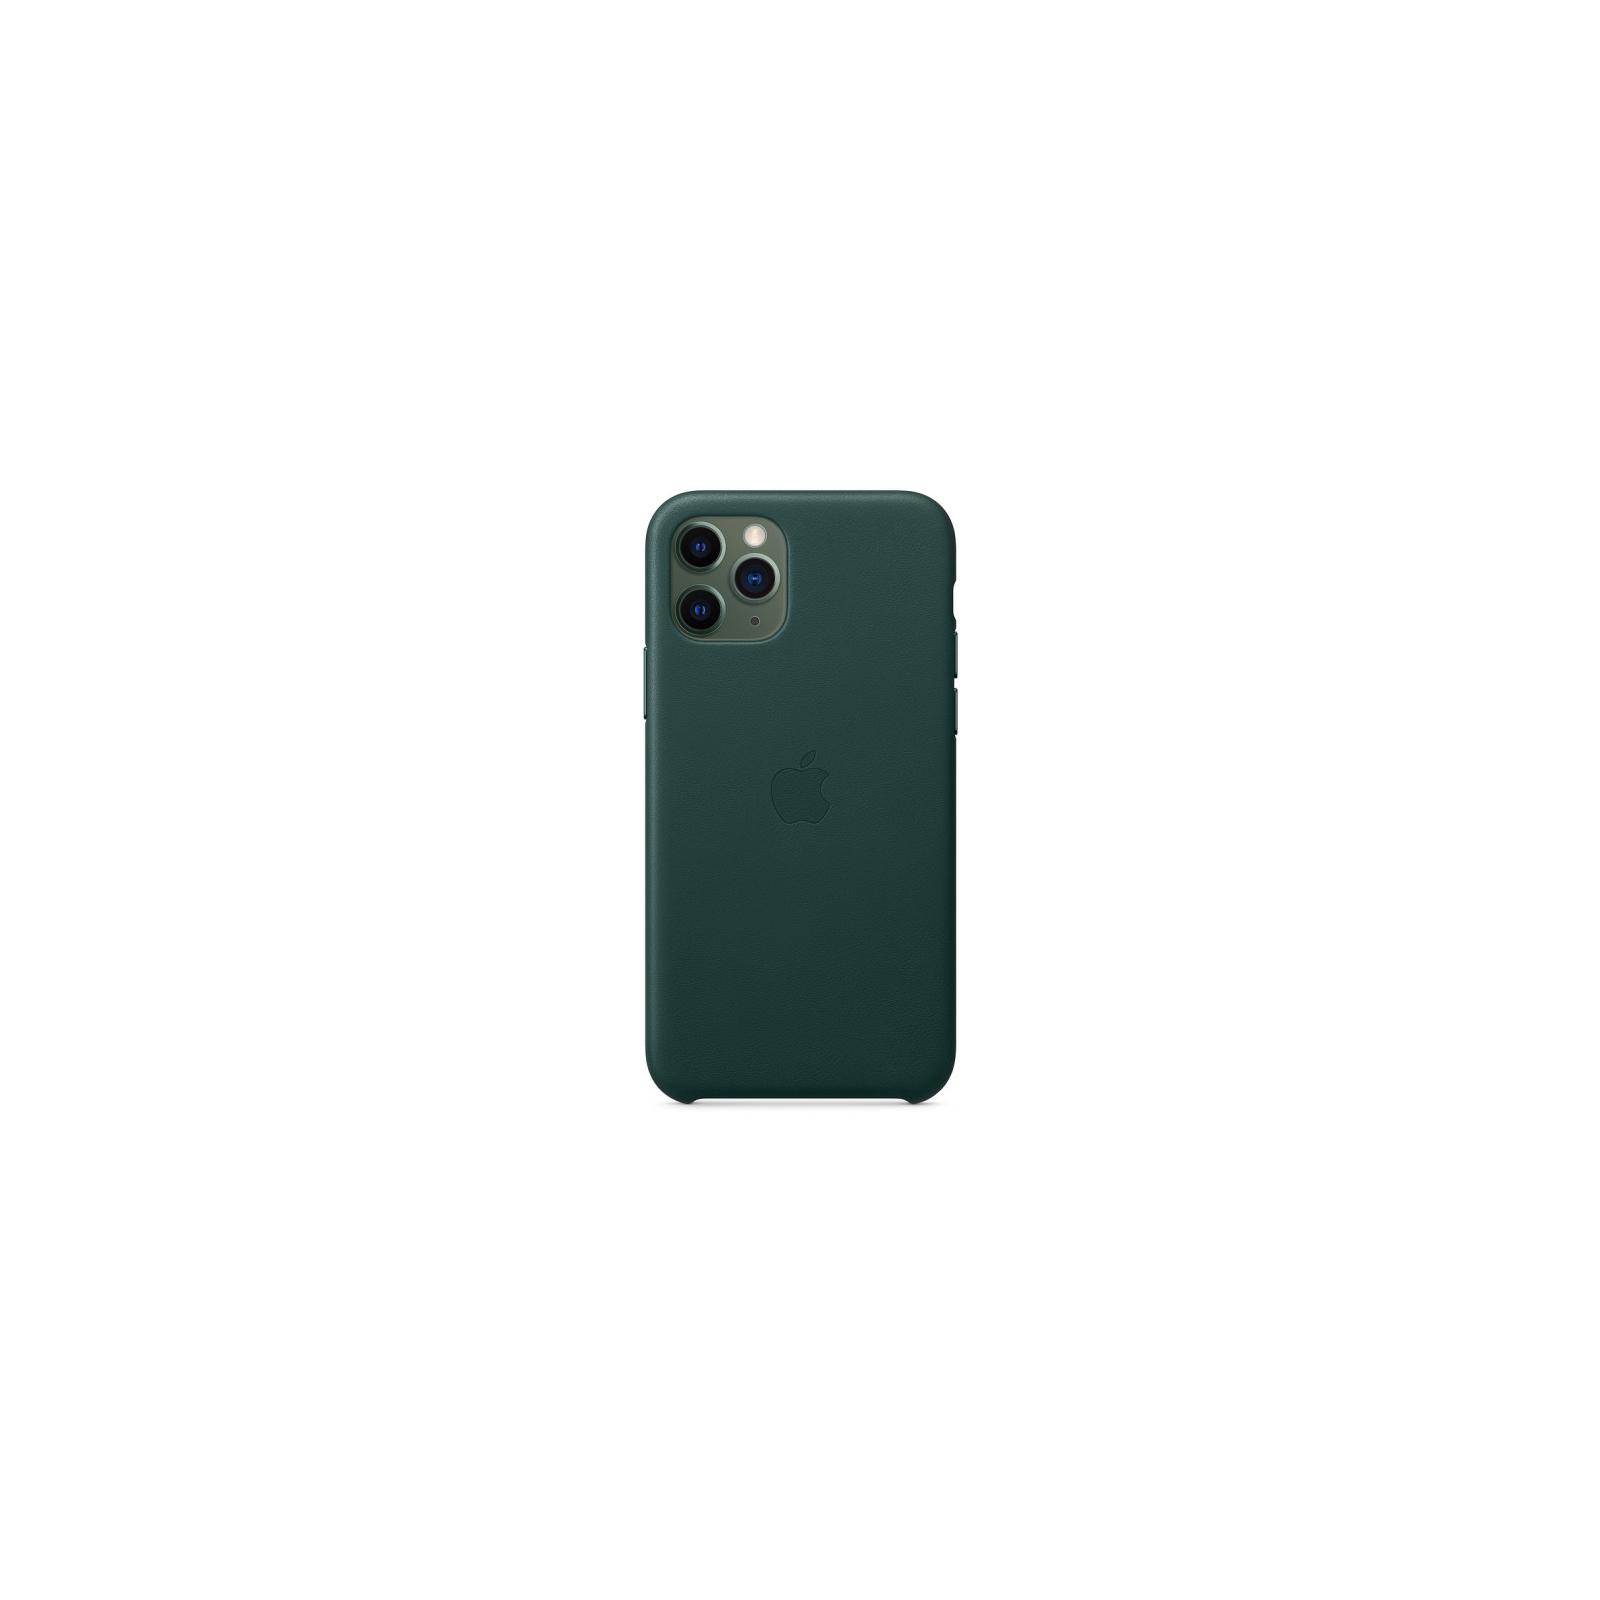 Чехол для моб. телефона Apple iPhone 11 Pro Leather Case - Midnight Blue (MWYG2ZM/A) изображение 3